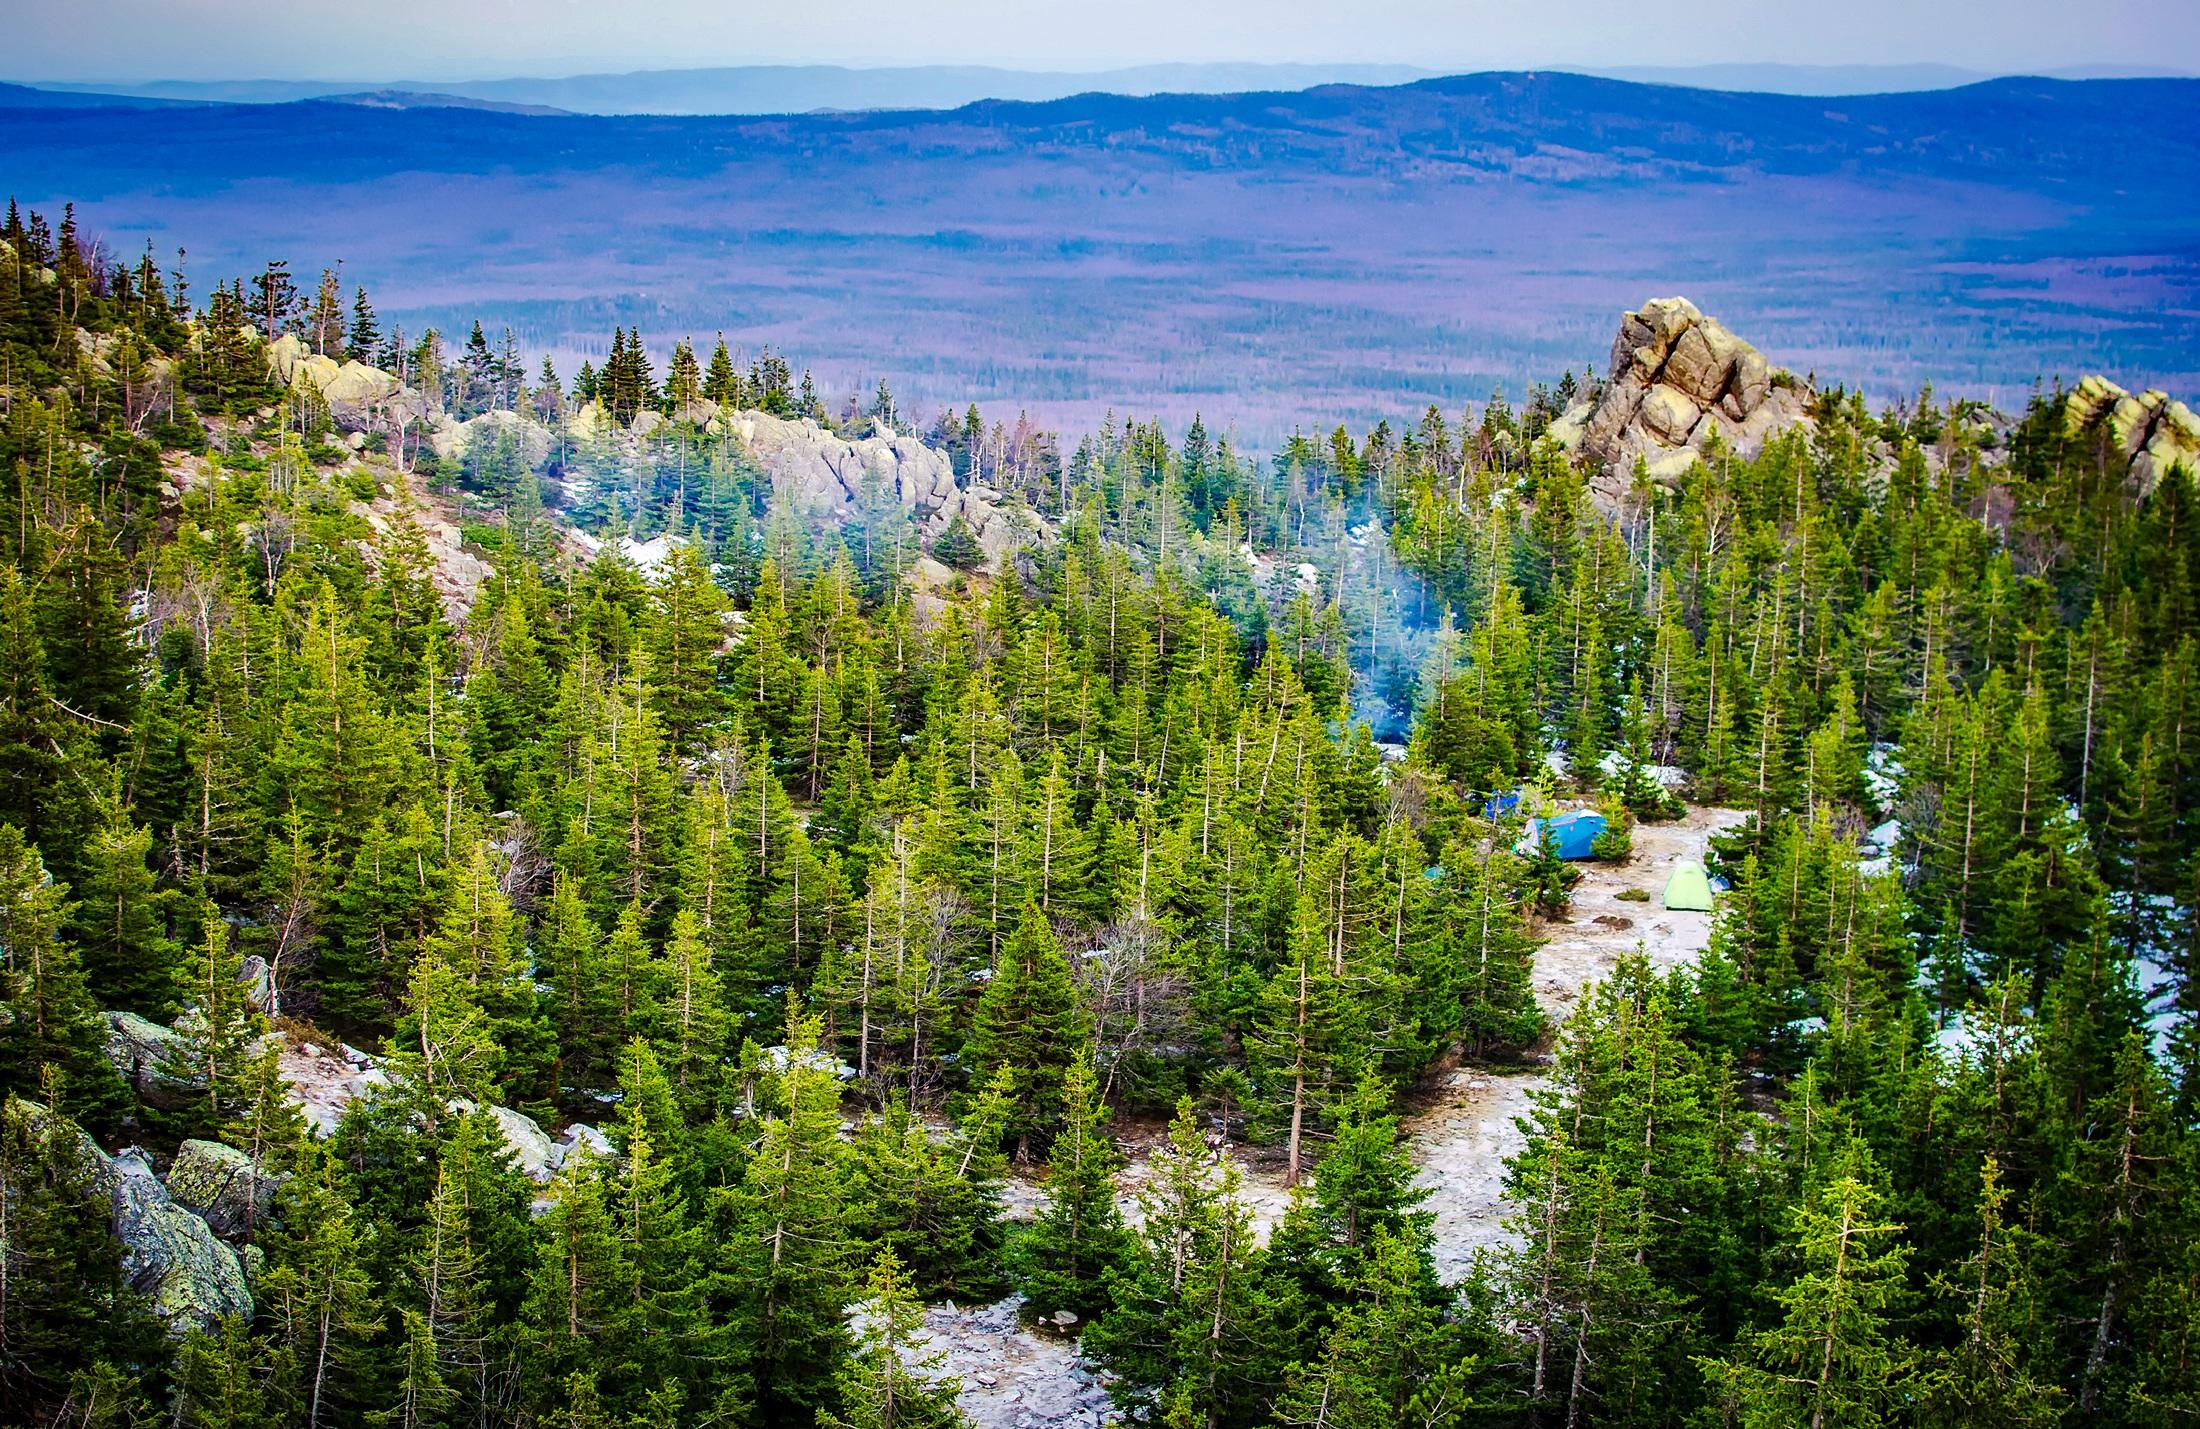 Free Images : landscape, tree, nature, wilderness, walking ...